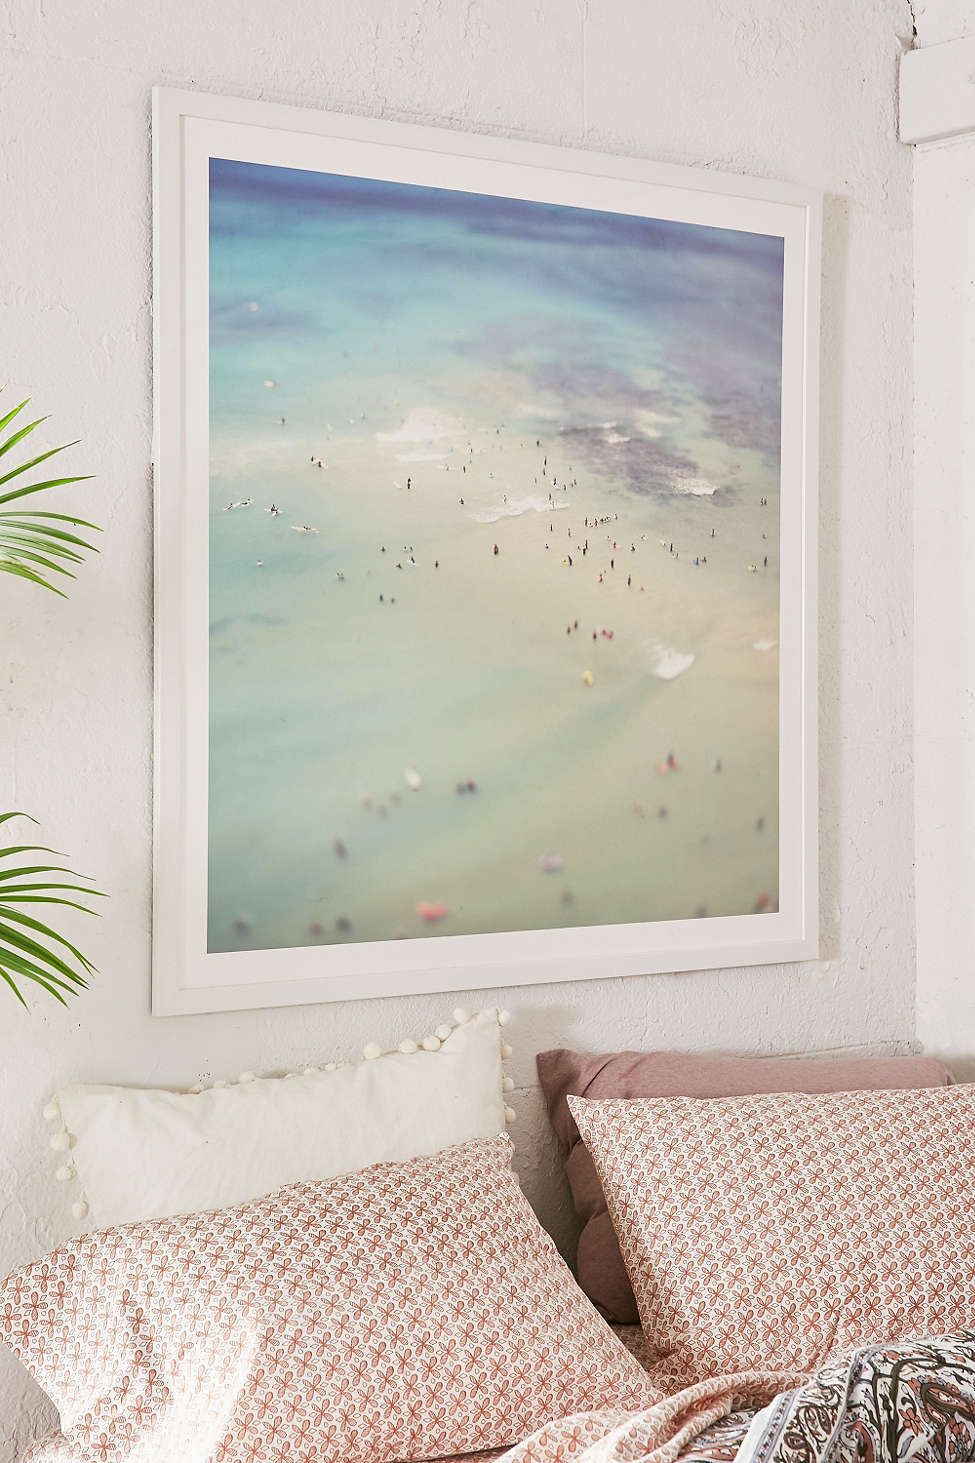 Beachy art print by Max Wanger